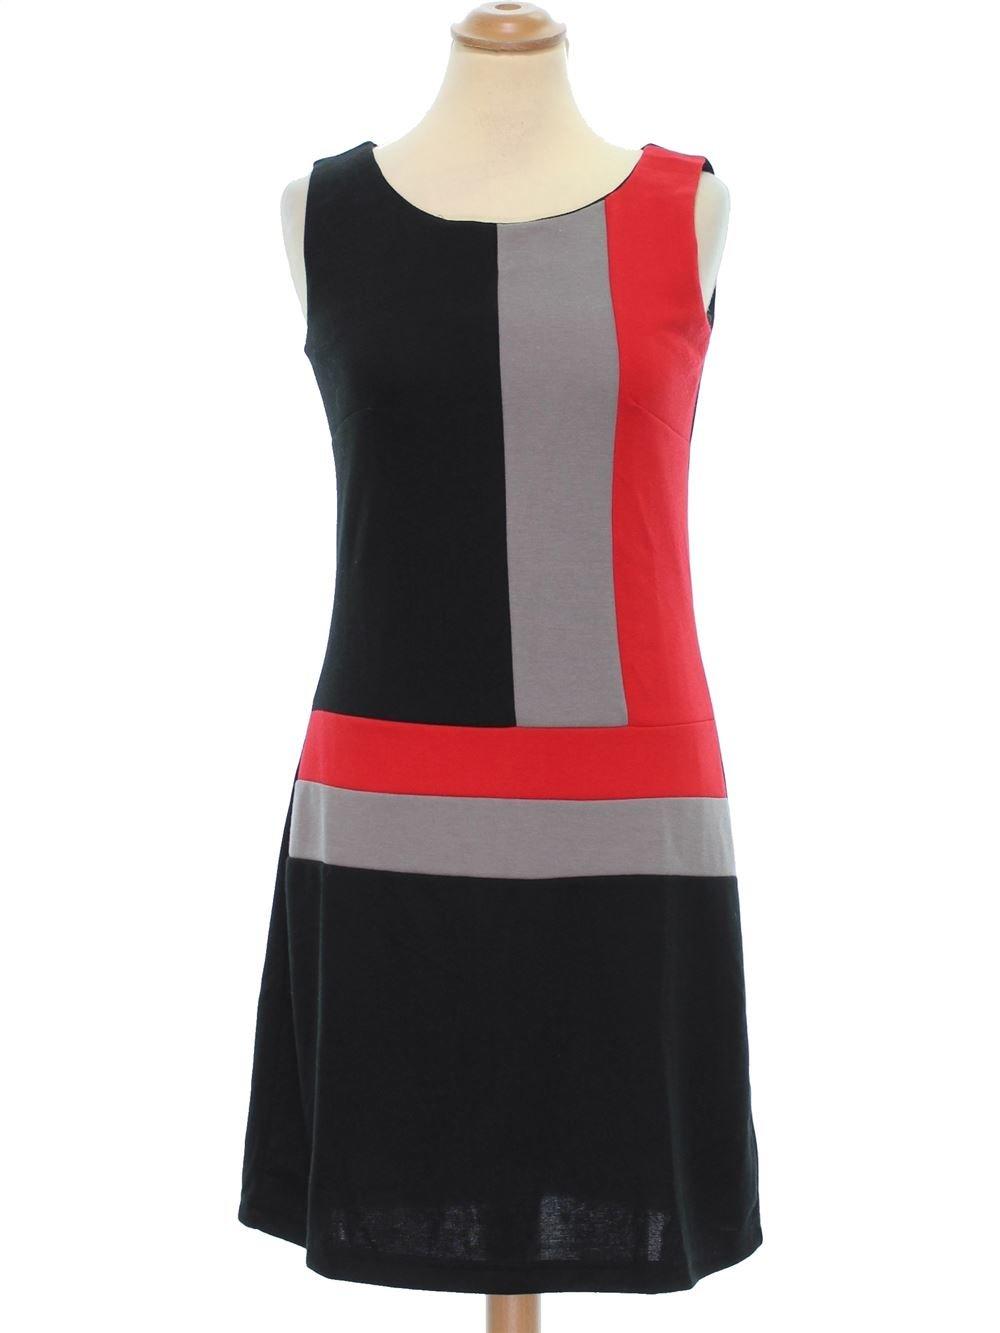 bas prix b6424 3aefd Robe Femme BLANCHE PORTE 36 (S - T1) pas cher, 6.99 € - #1287815